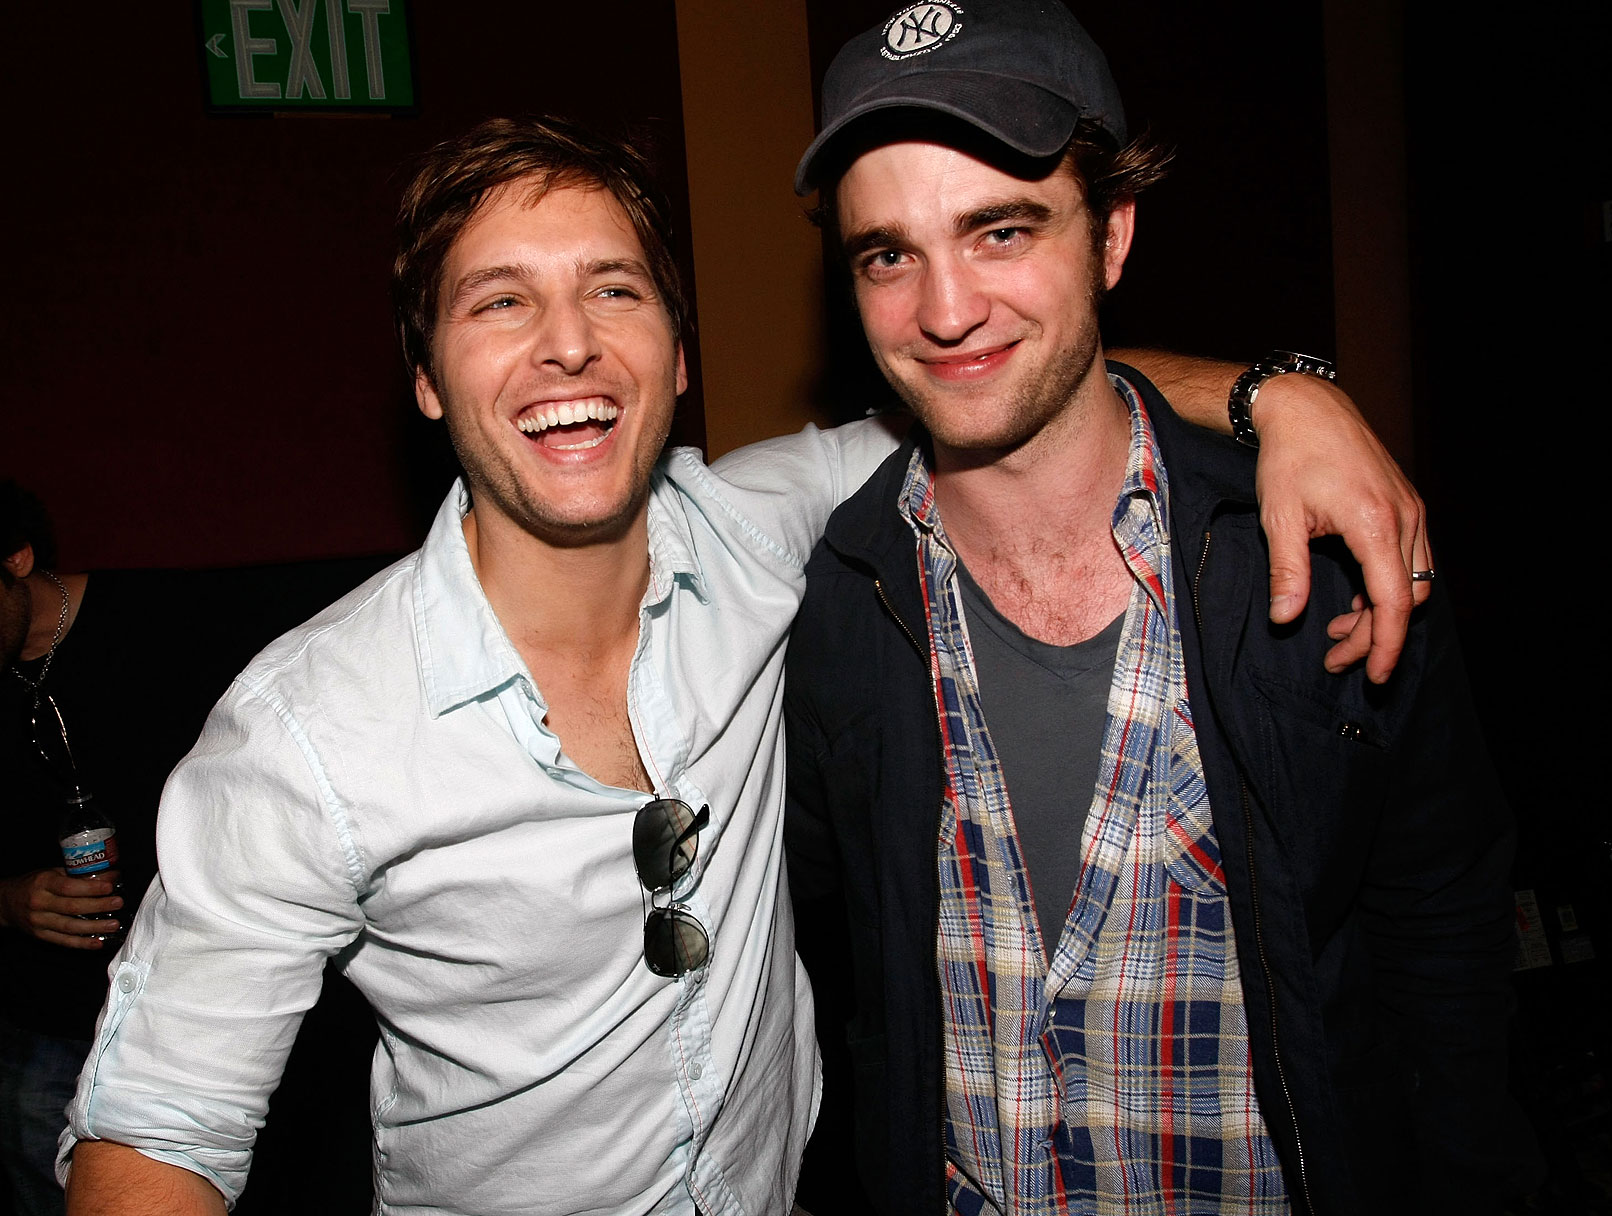 Robert Pattinson Tweets! Stop The Presses!!!!